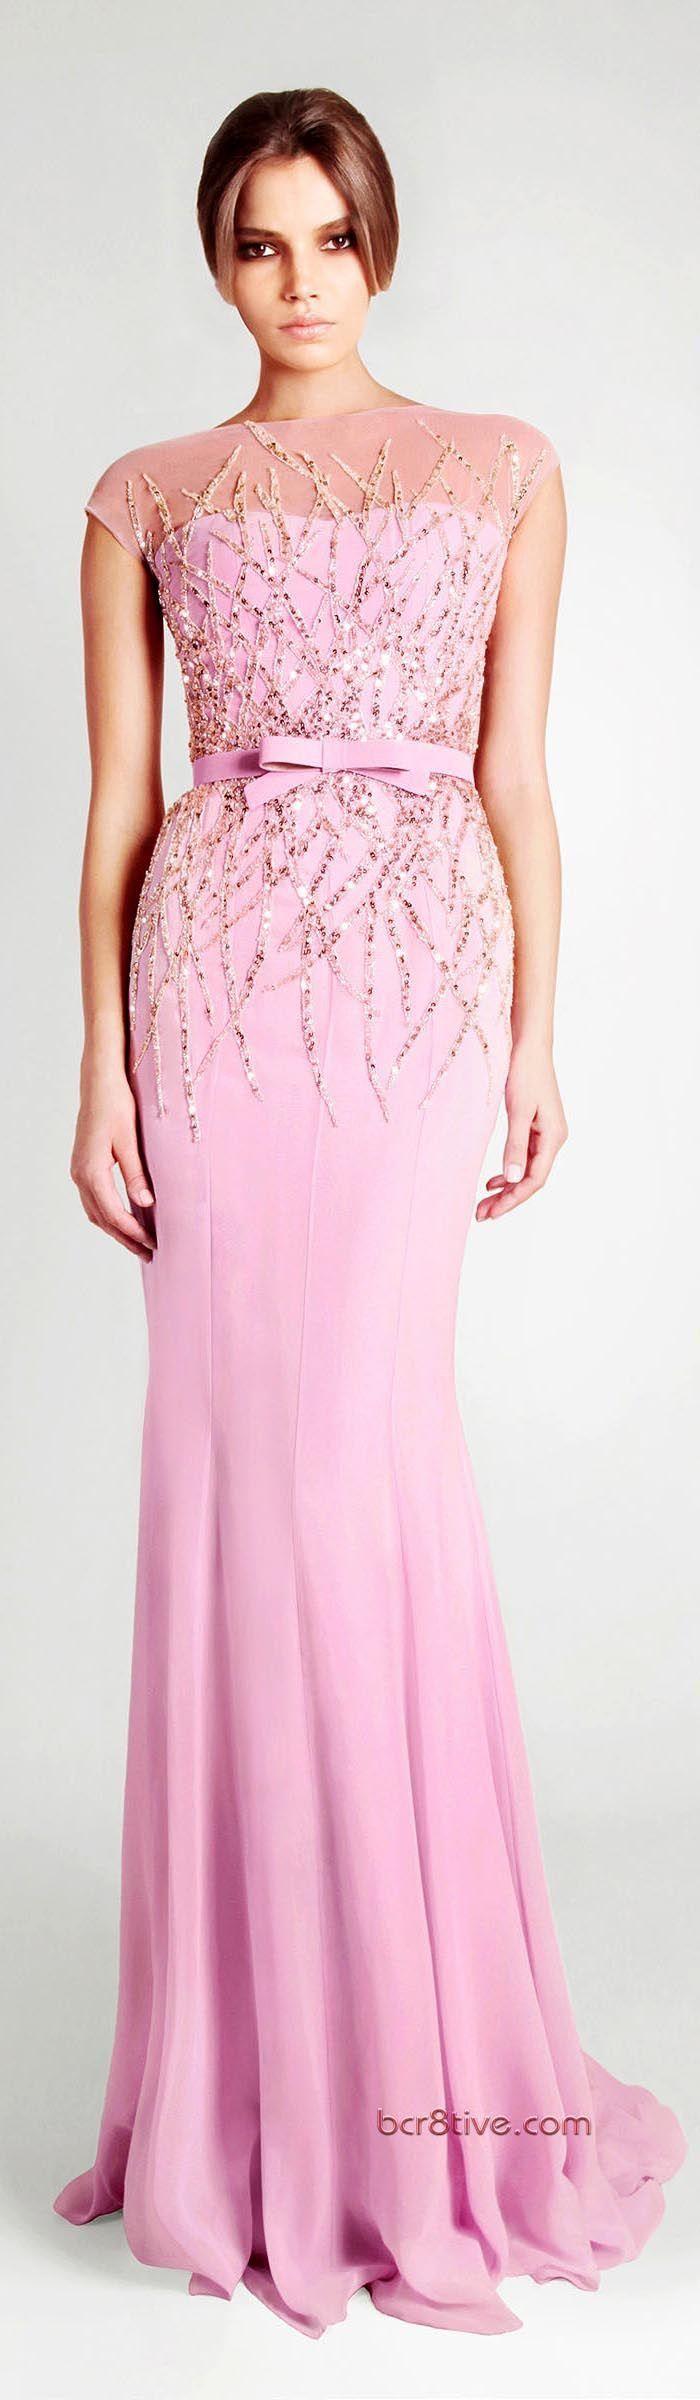 33 best Bridesmaids images on Pinterest | Formal evening dresses ...